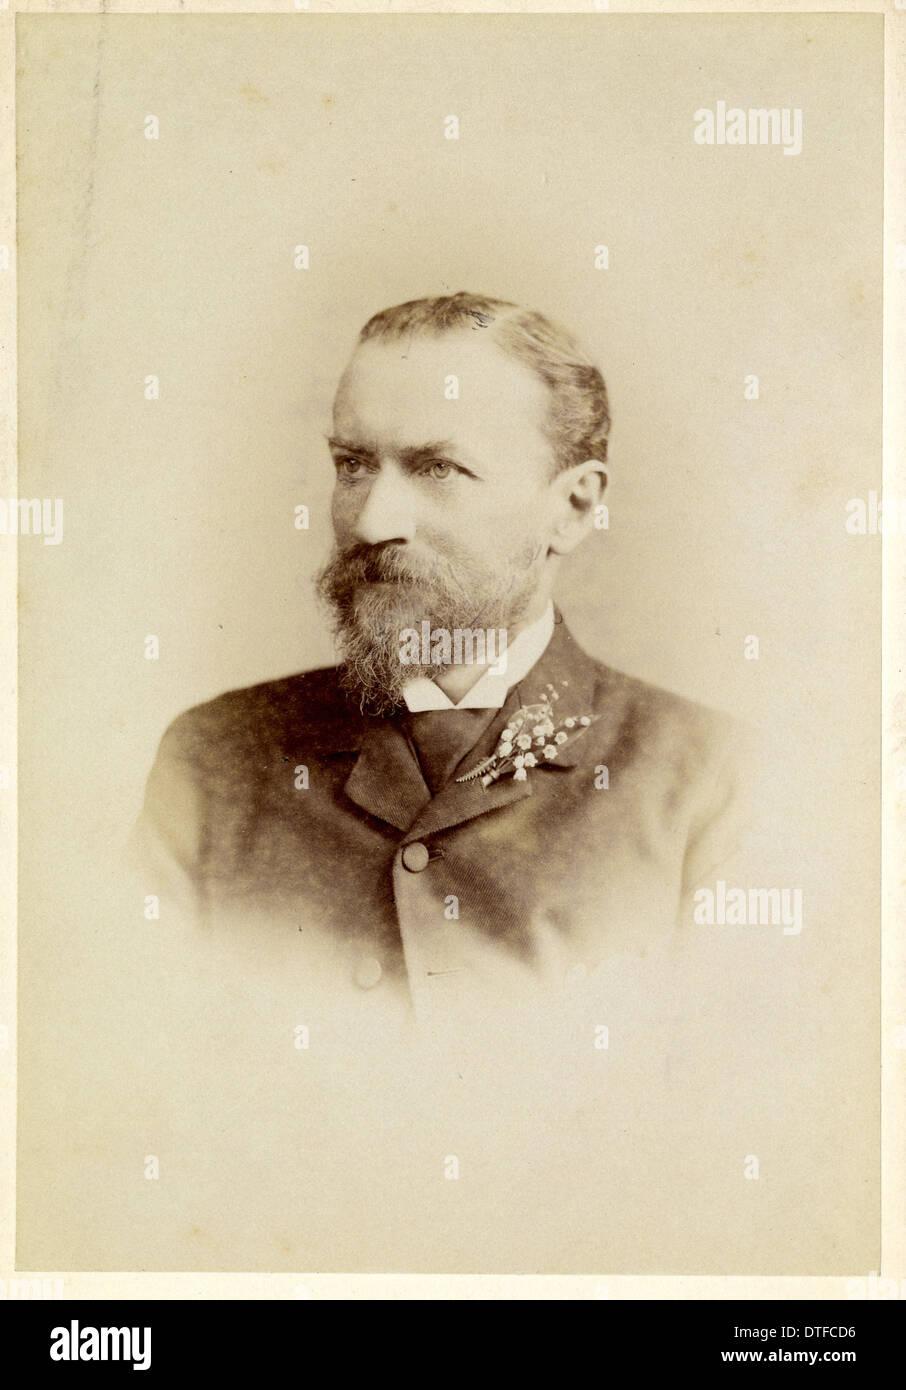 Albert Gunther Butler - Stock Image